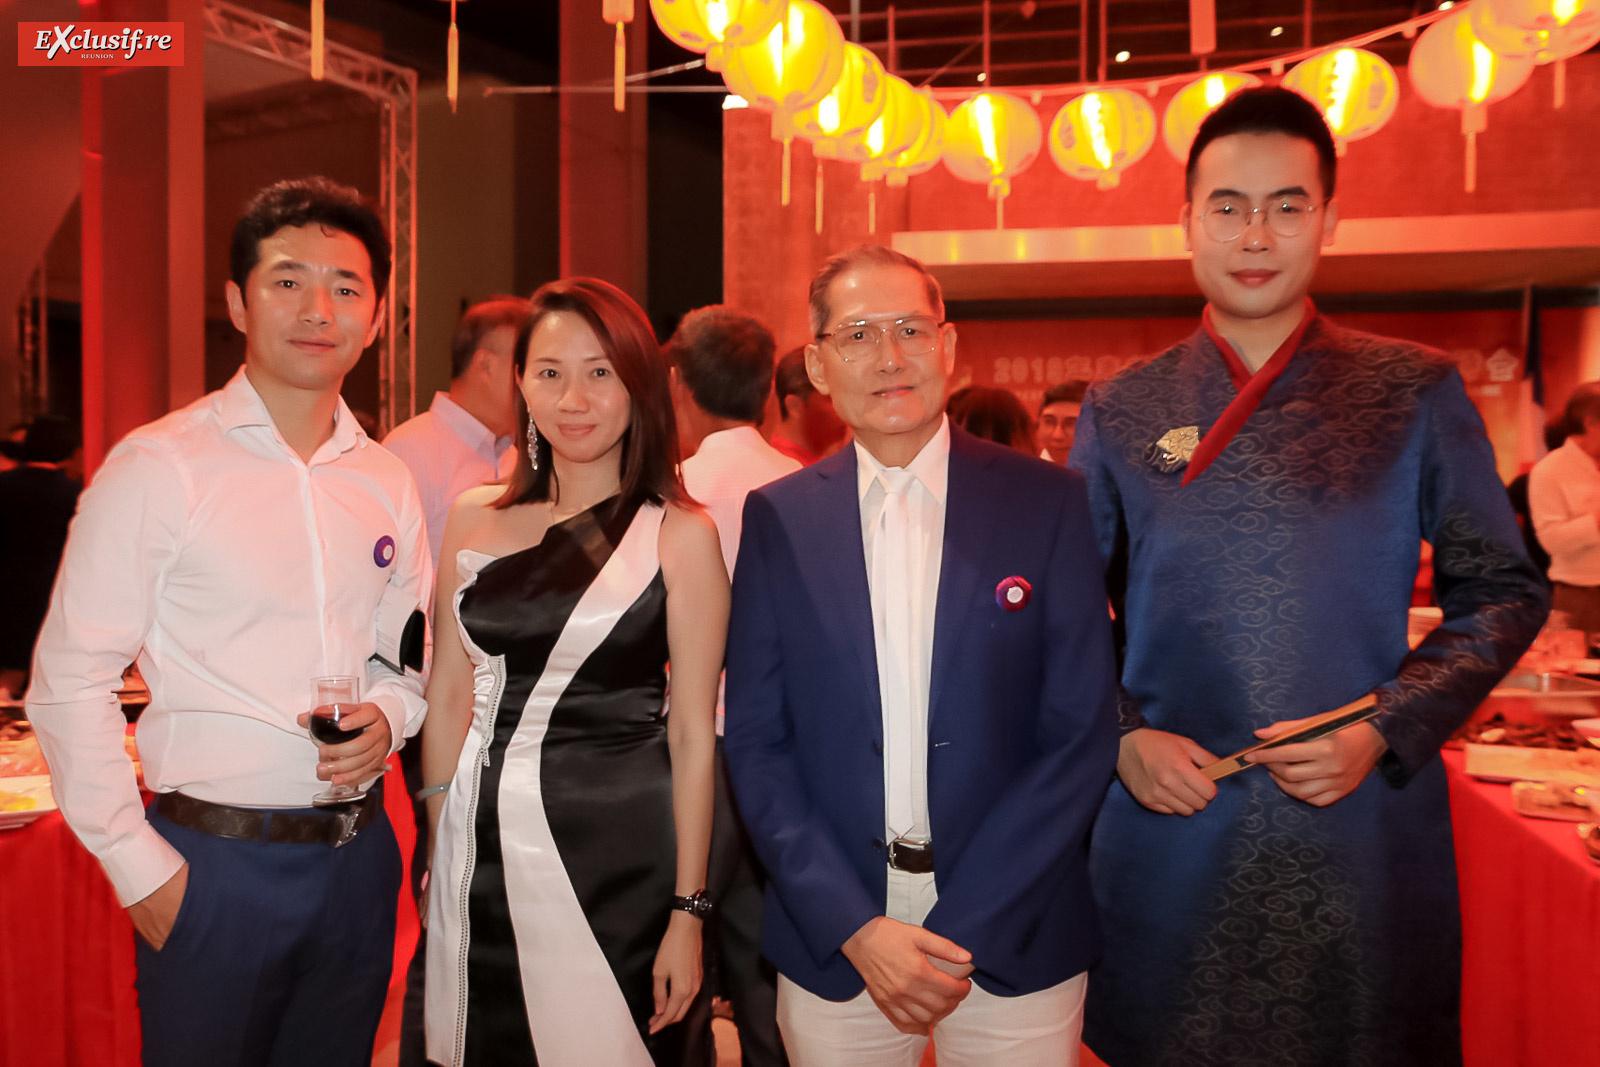 Wang Néo, Karine Aein, Marcel Fock Sun, de Studio Universal, et un membre du groupe de Nanjing